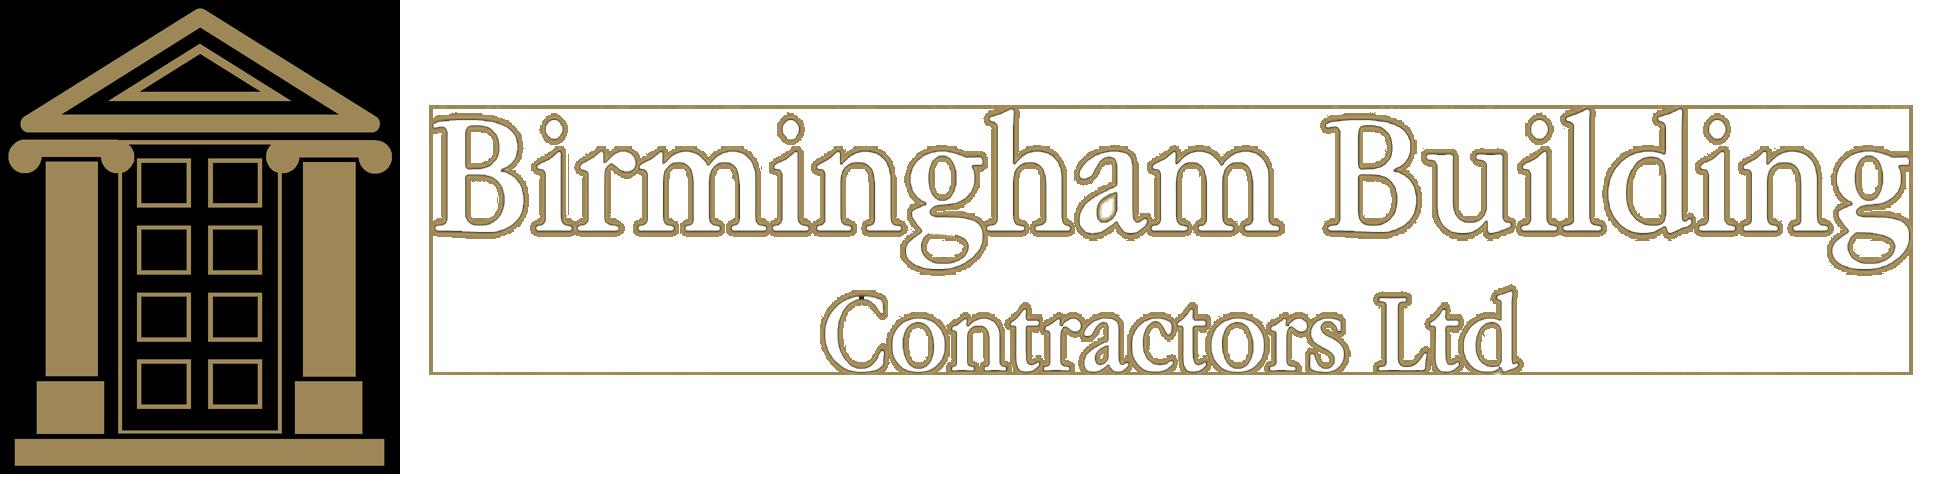 Birmingham Building Contractors Ltd